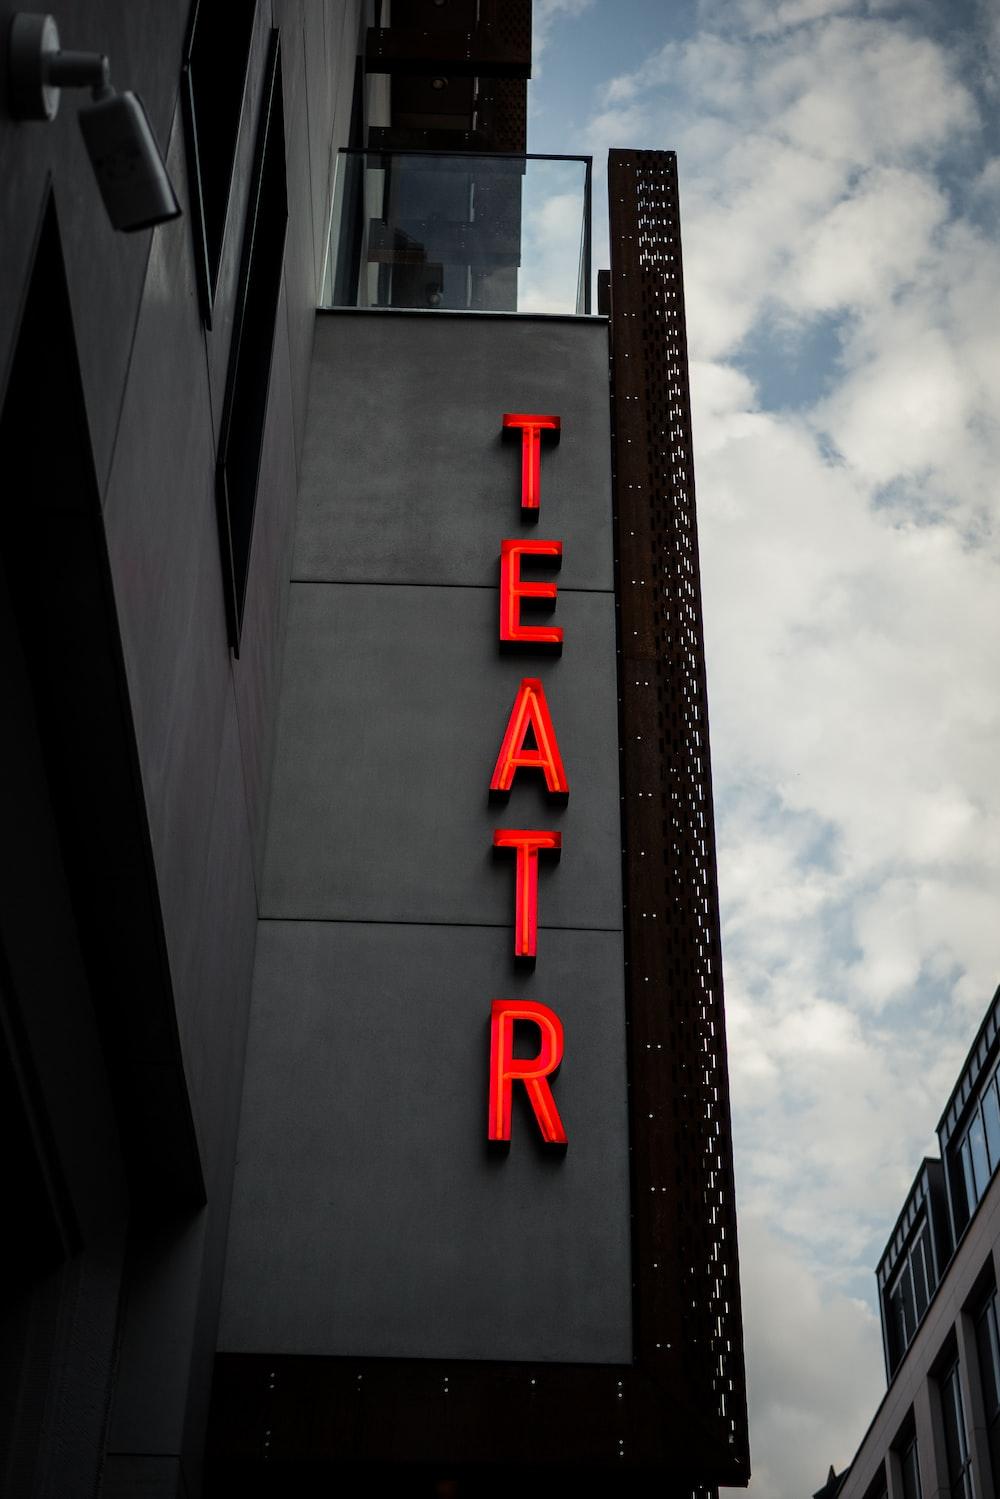 Teatr sign